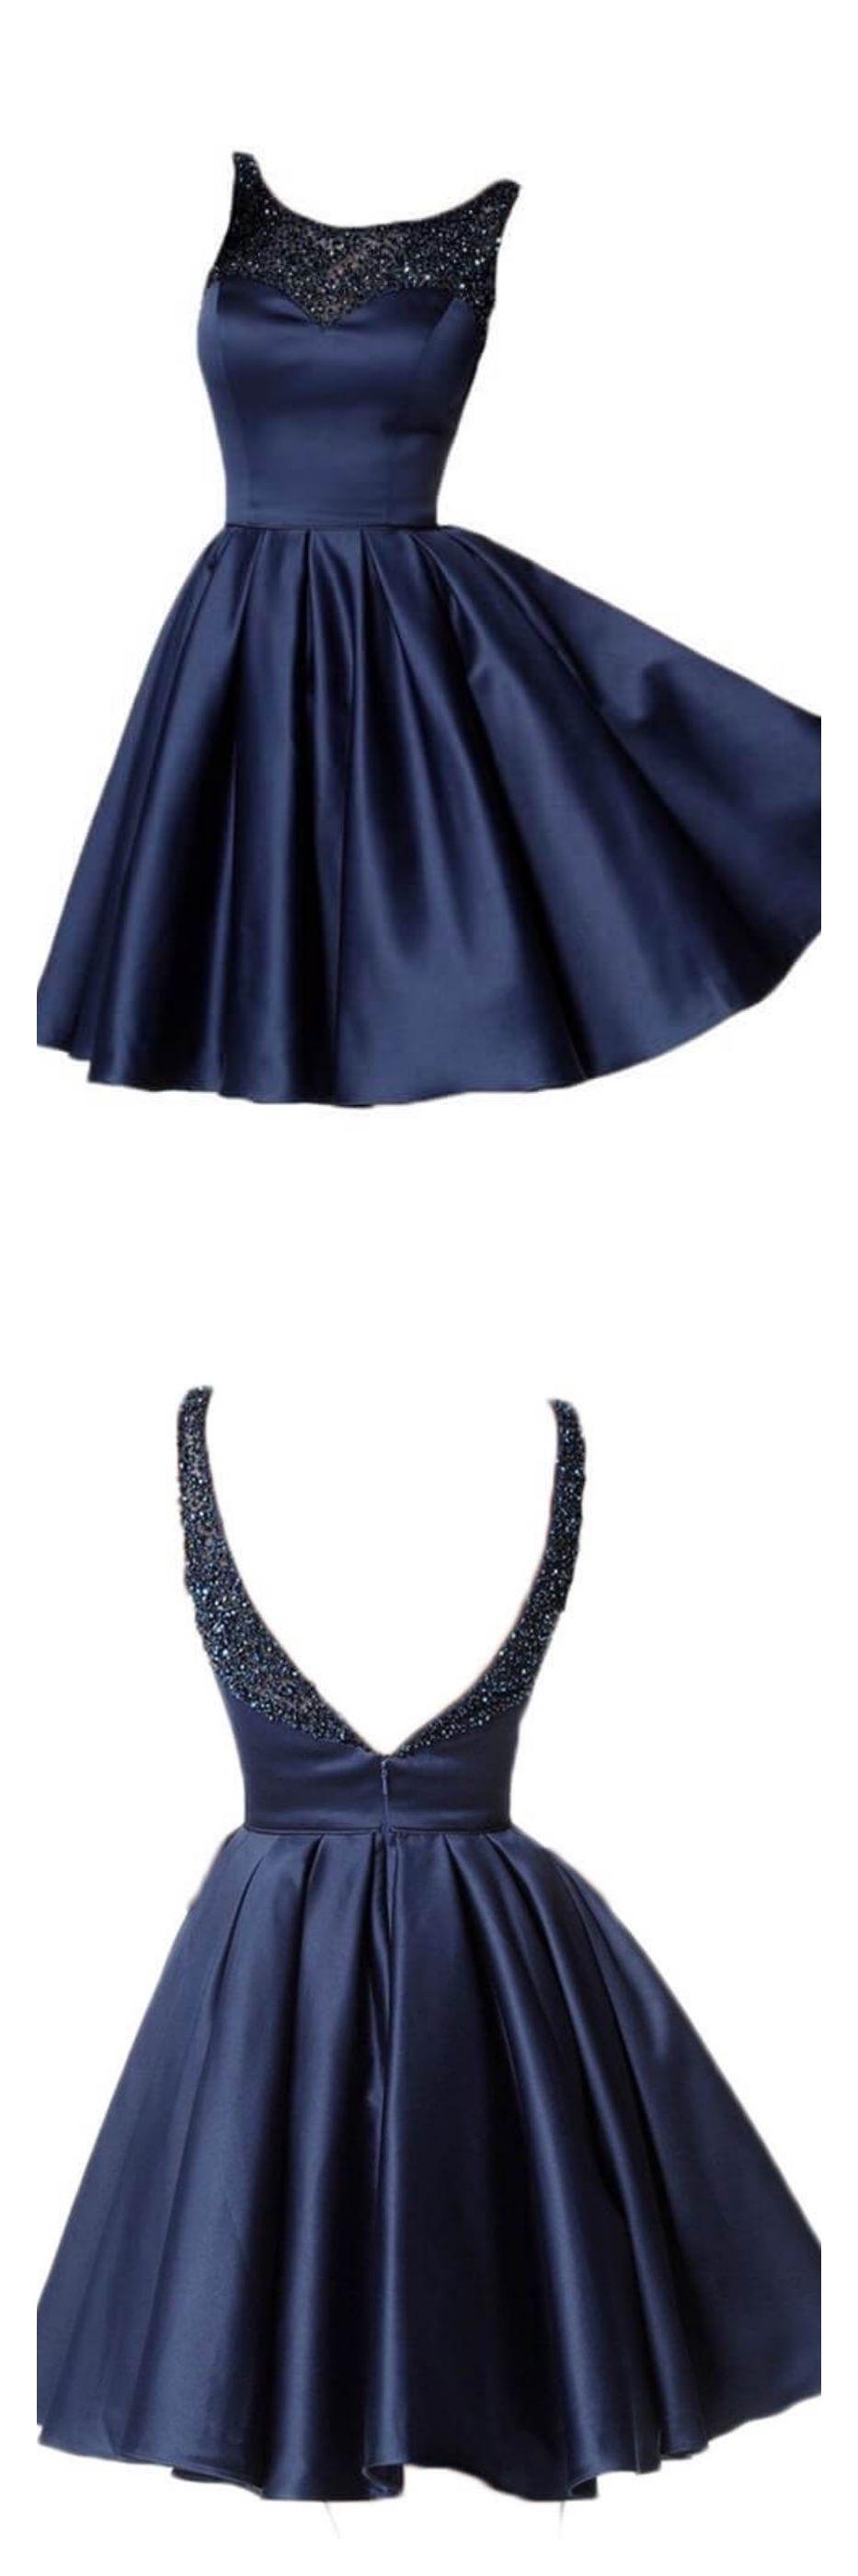 Navy blue short satin homecoming dresses with beadinged